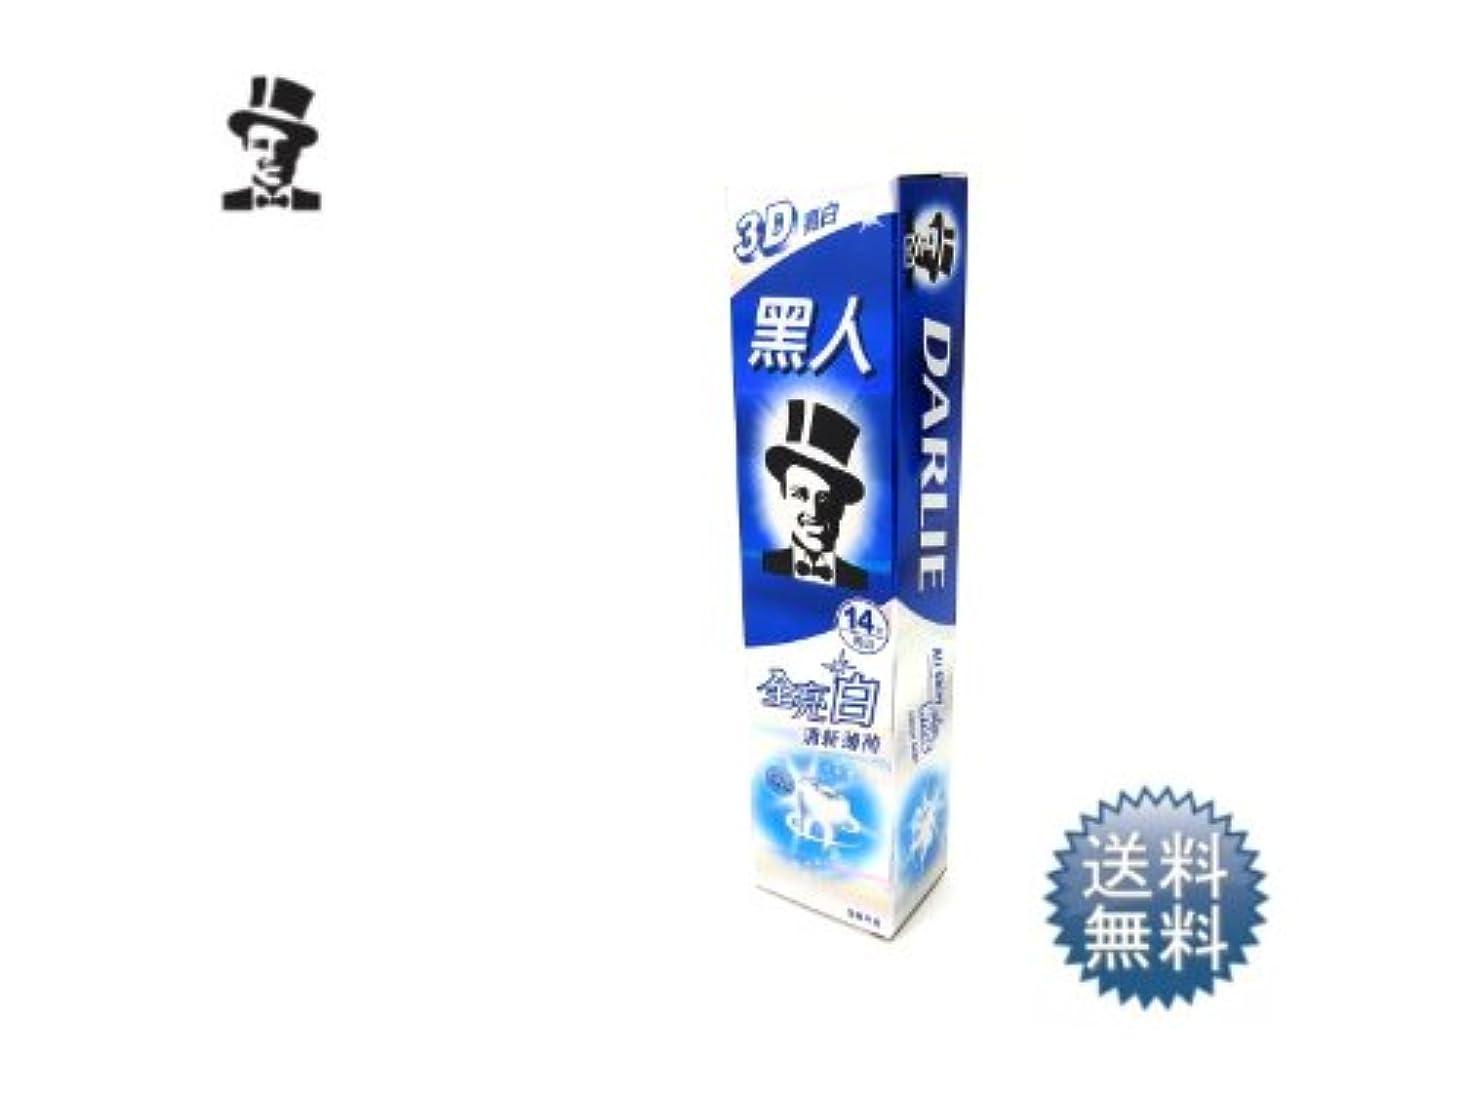 妊娠した是正歴史的台湾 黒人 歯磨き粉 全亮白 清新薄荷 140g